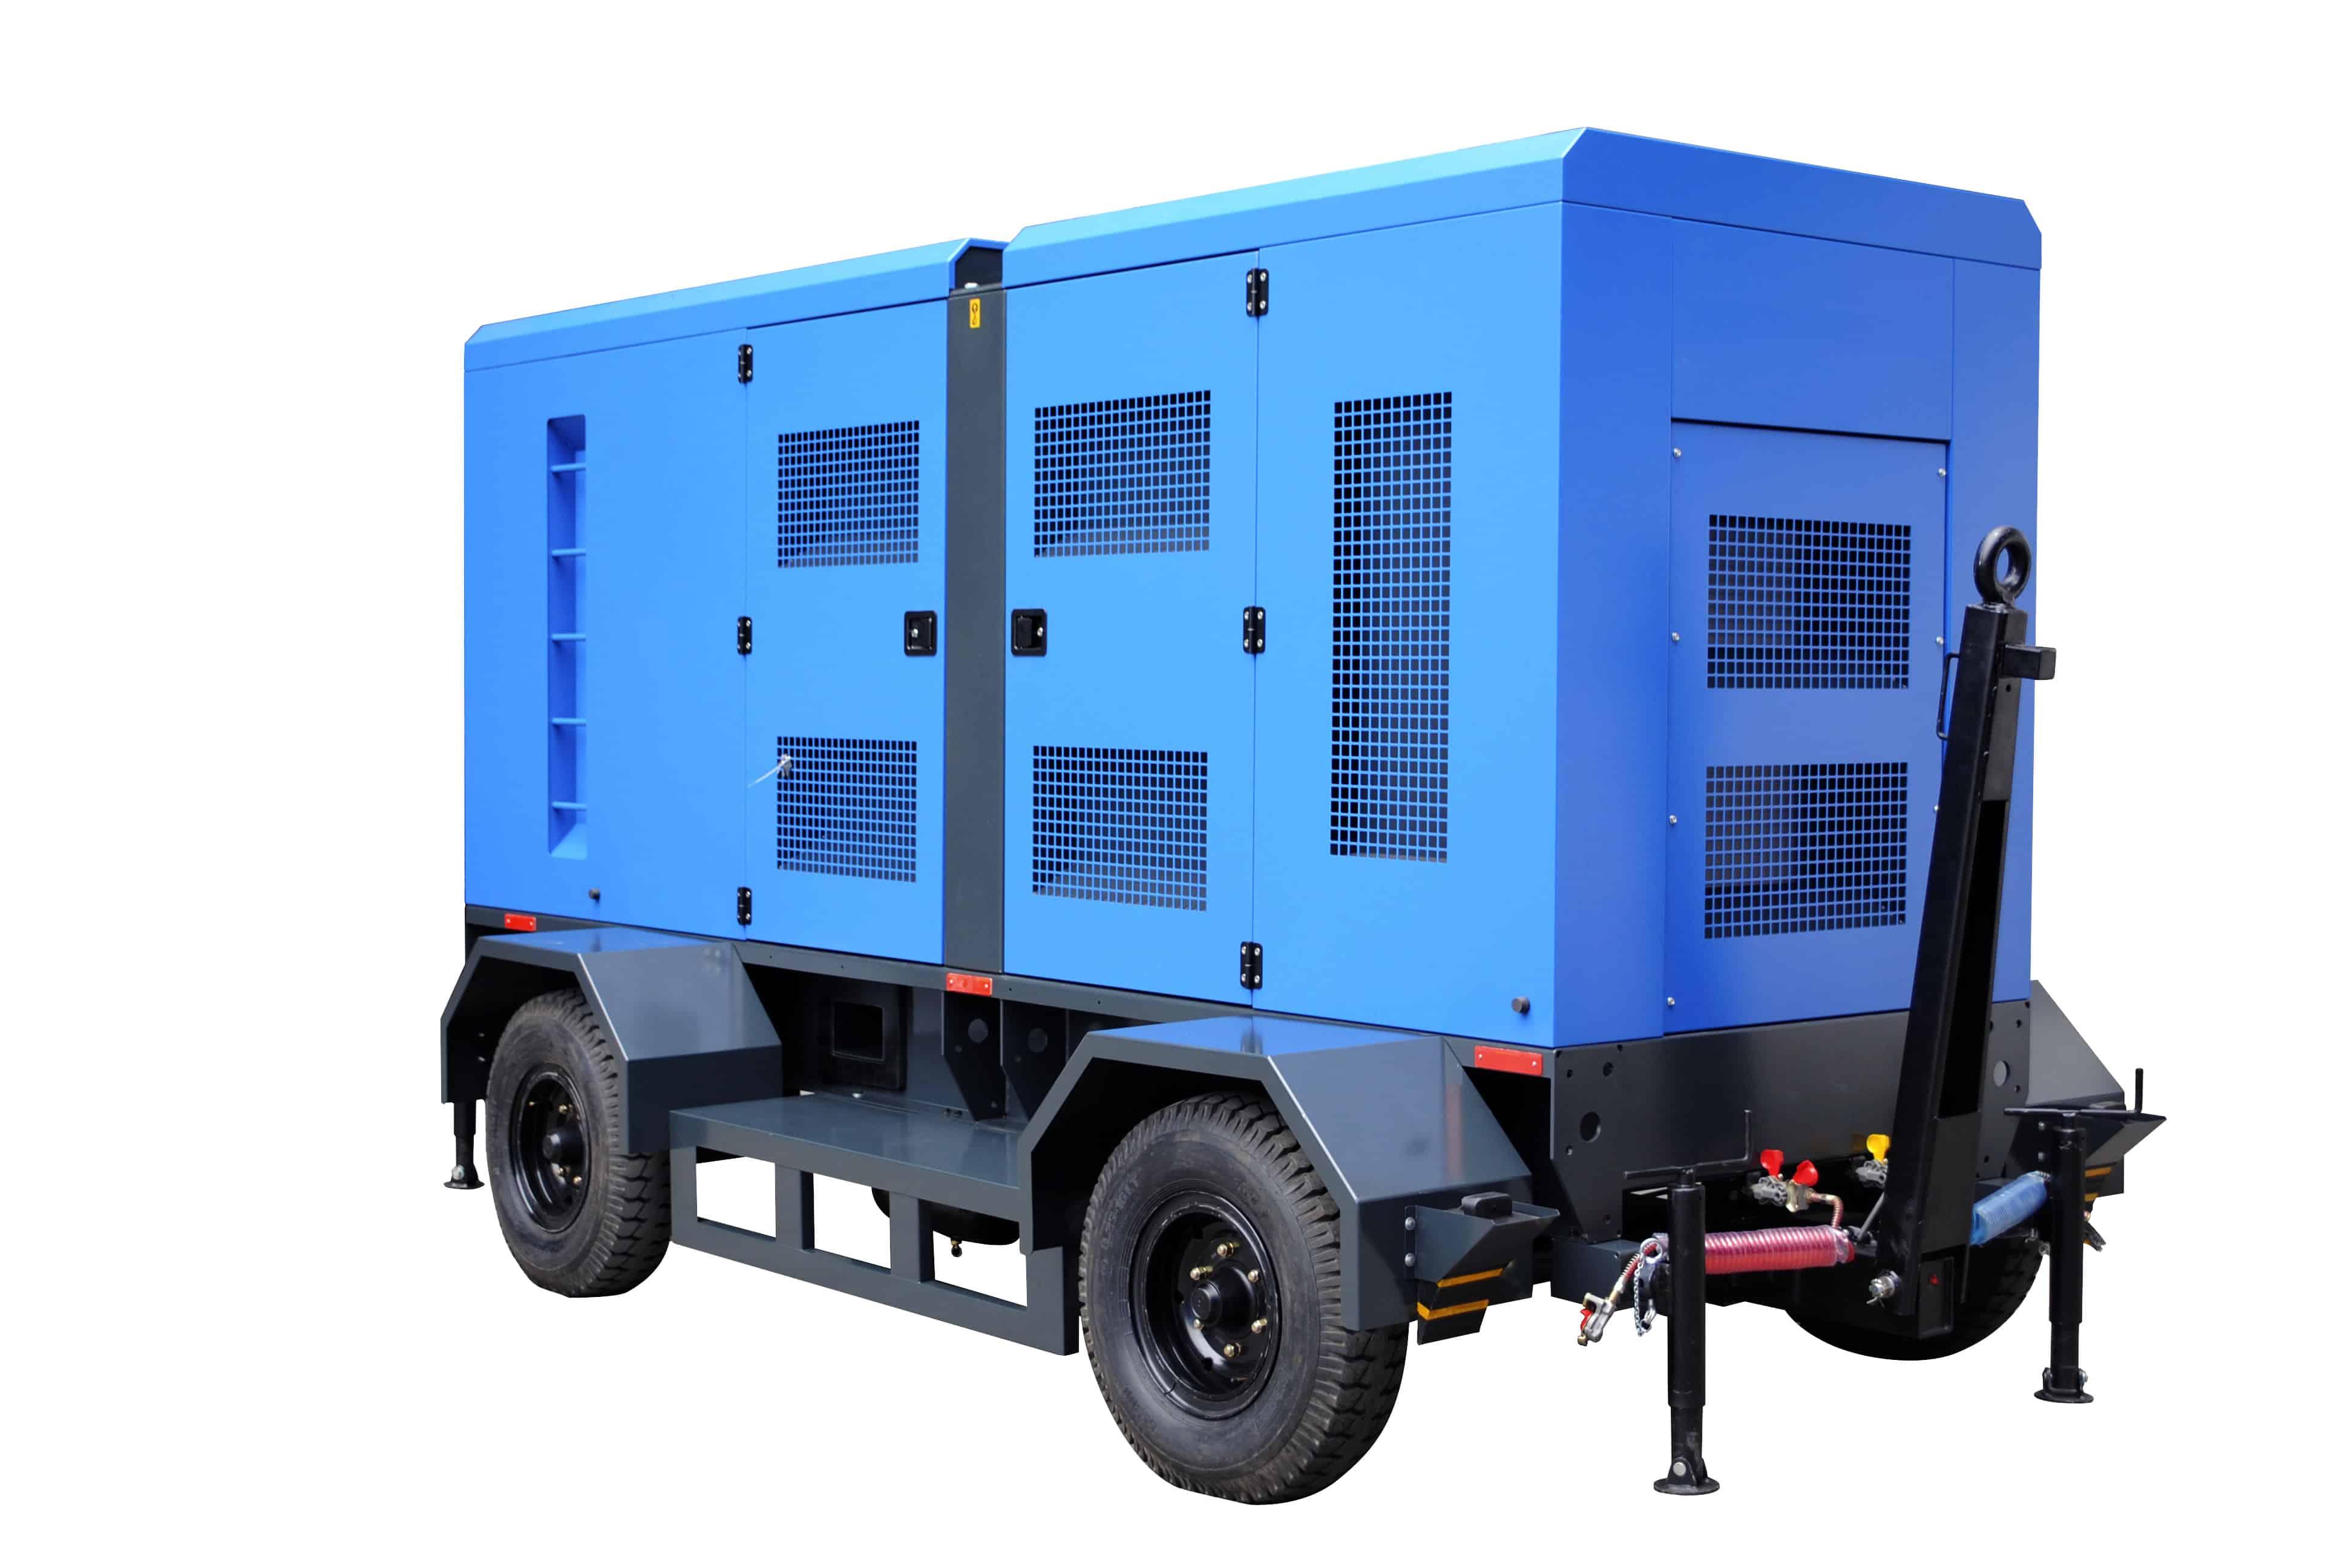 4 landing-gears generator trailer